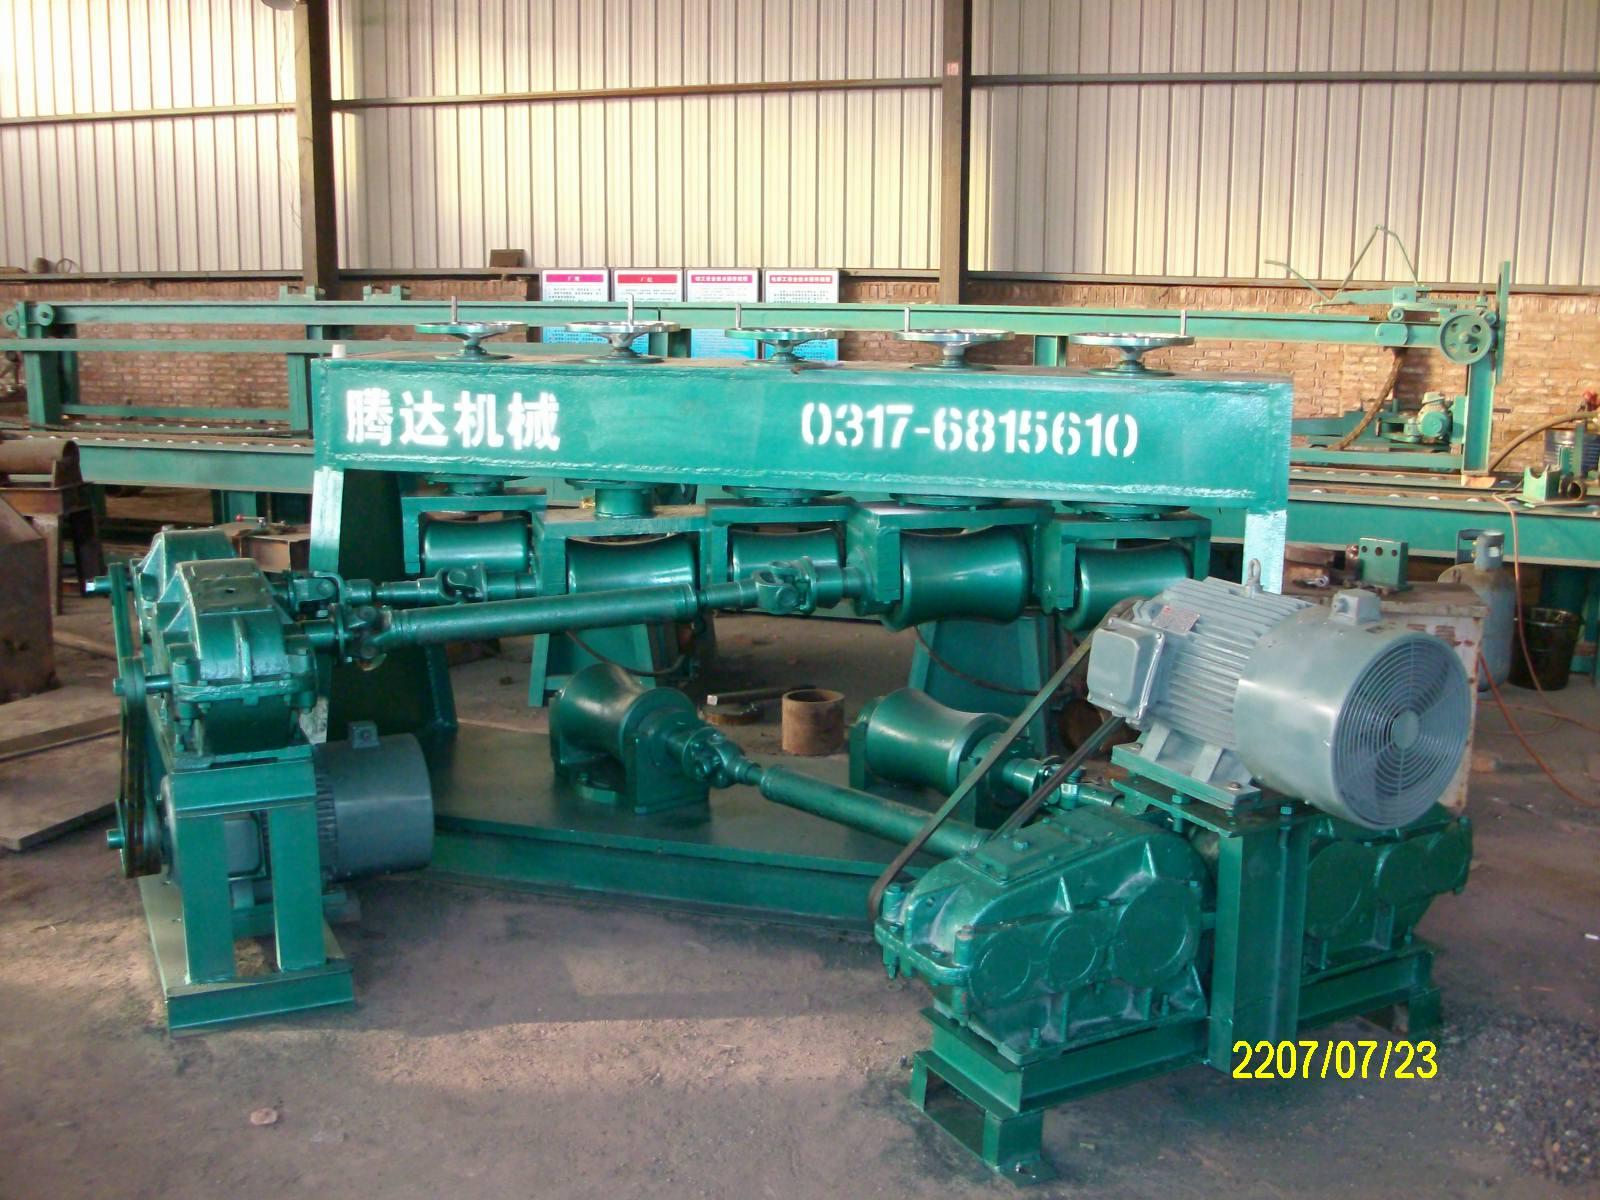 Steel tube straightening machine /Manufacturing and